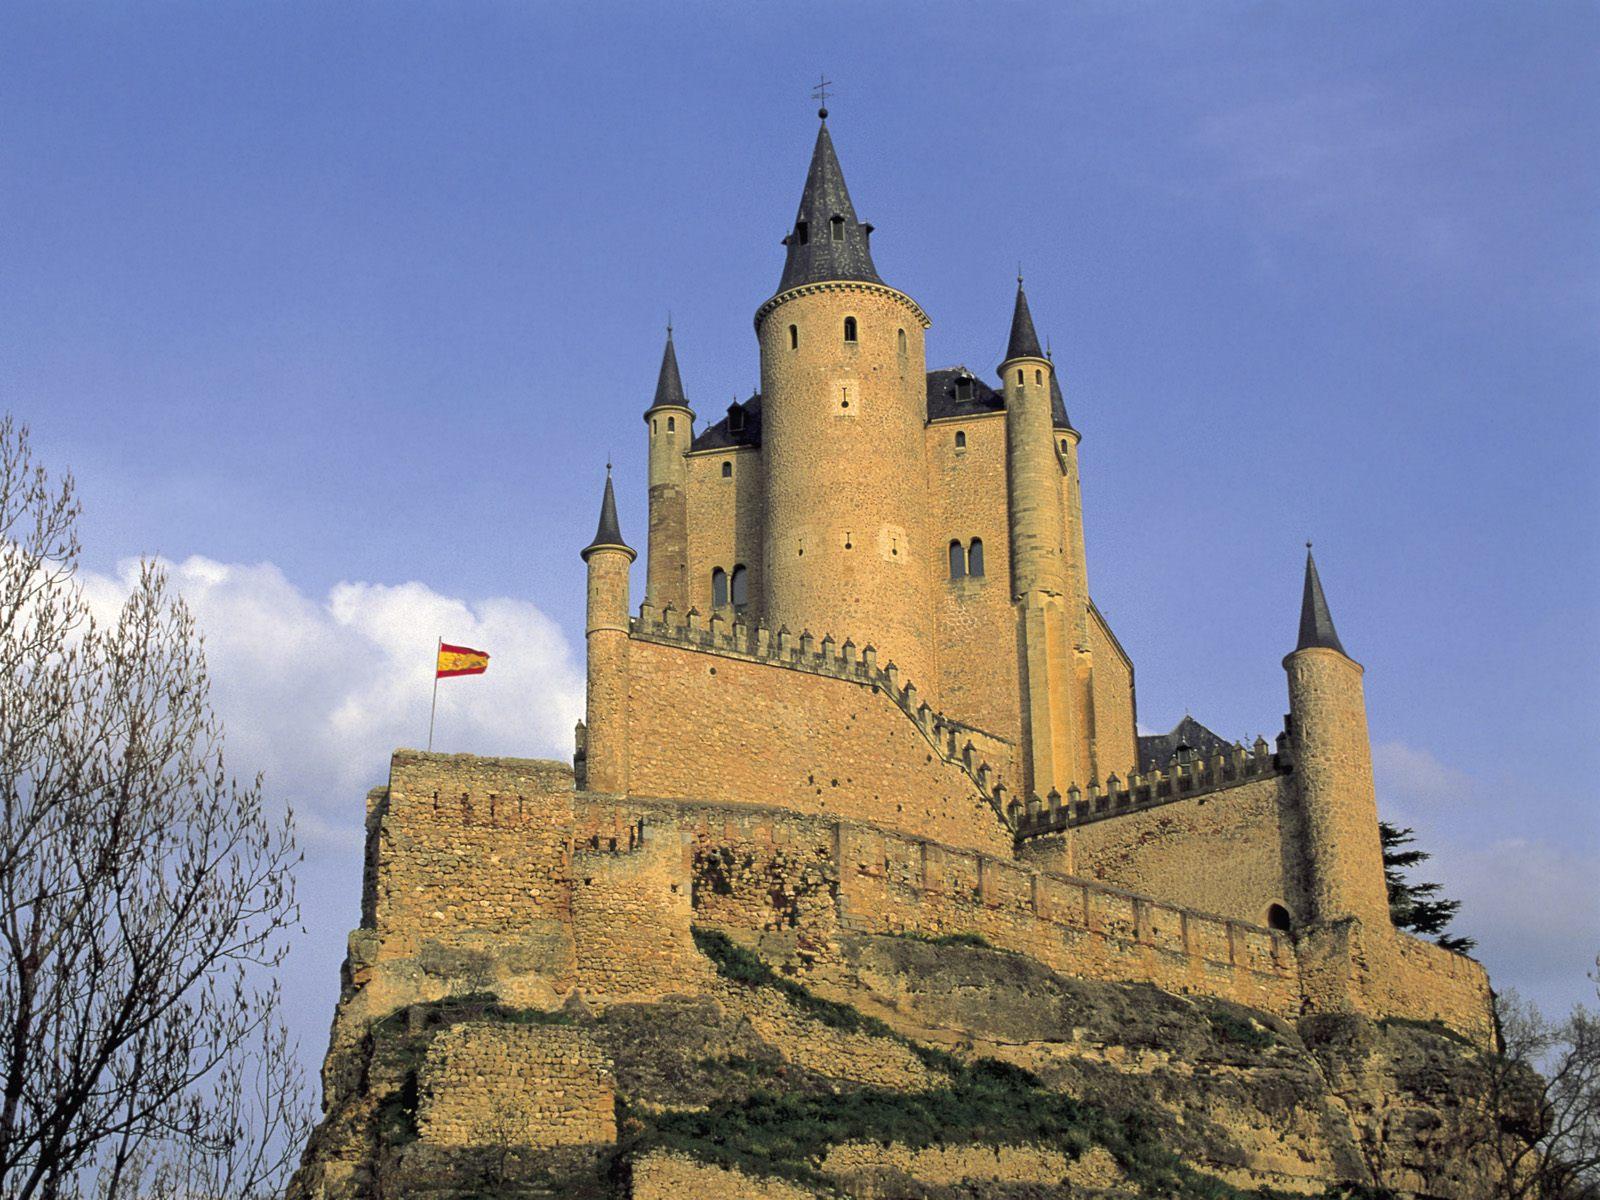 Segovia Spain  City pictures : Open Thread, Tuesday 15 January 2013 – Segovia, Spain